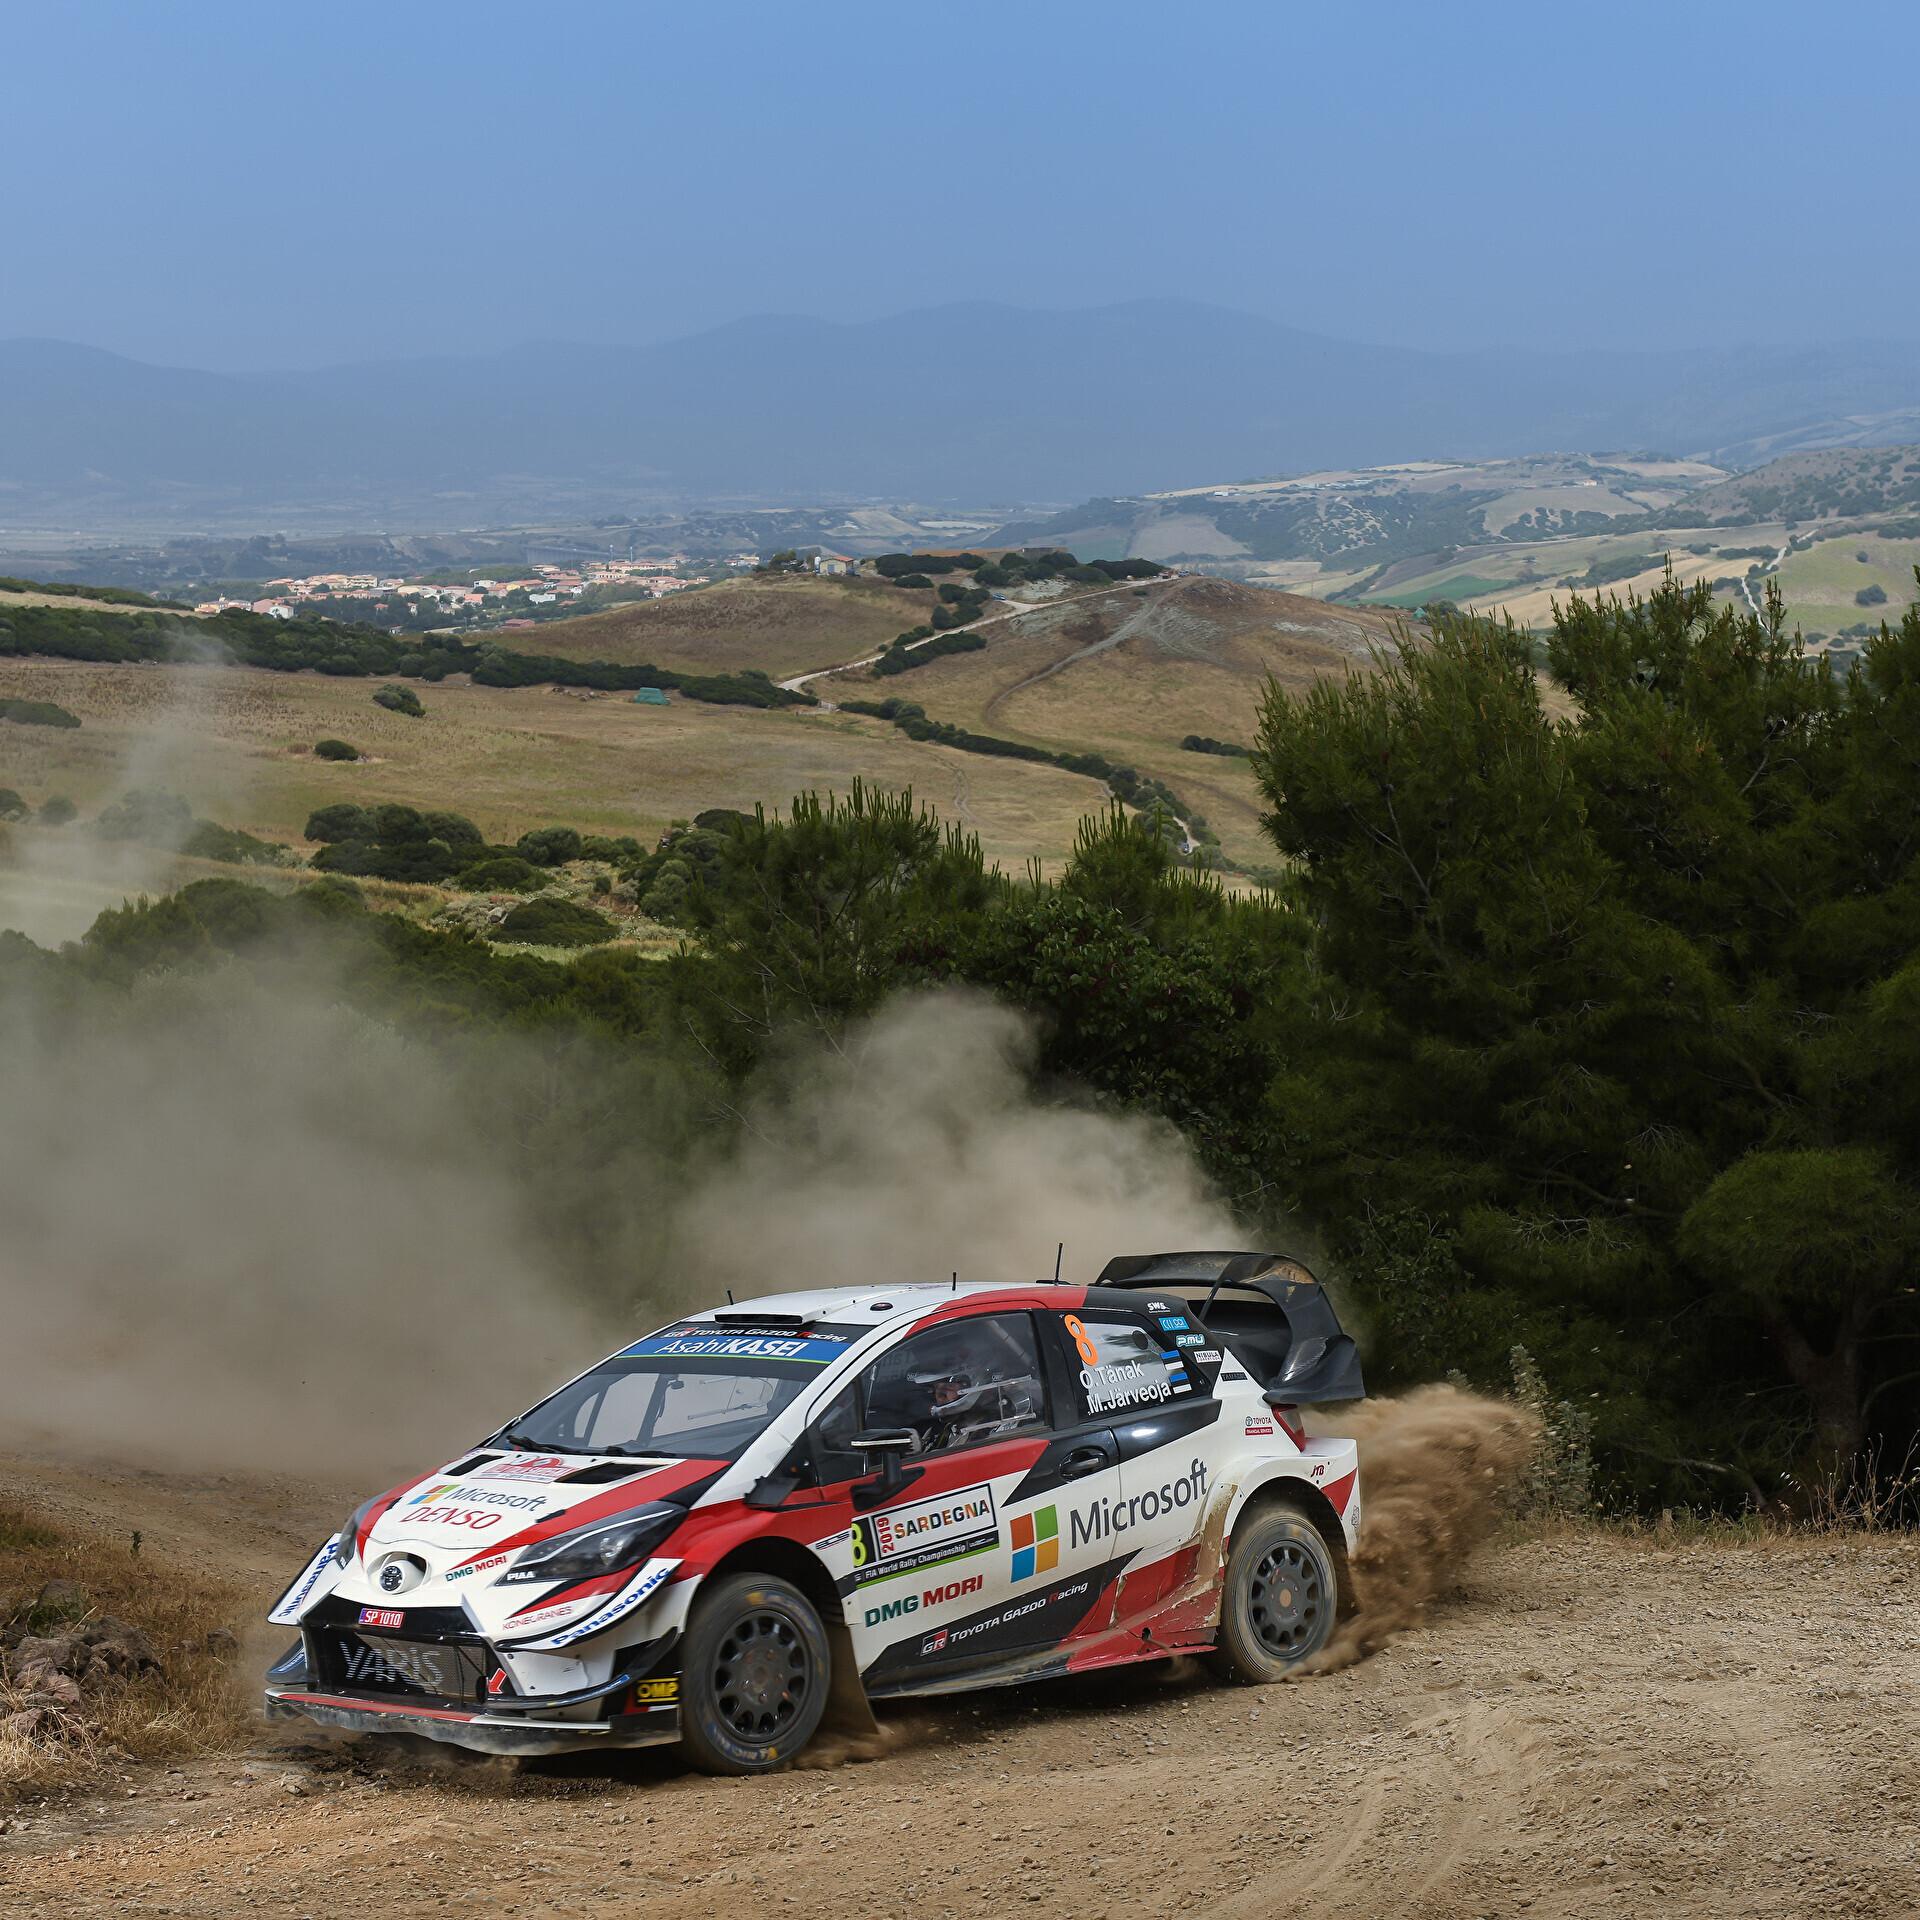 Video: Steering issues in final stage cost Ott Tänak Rally